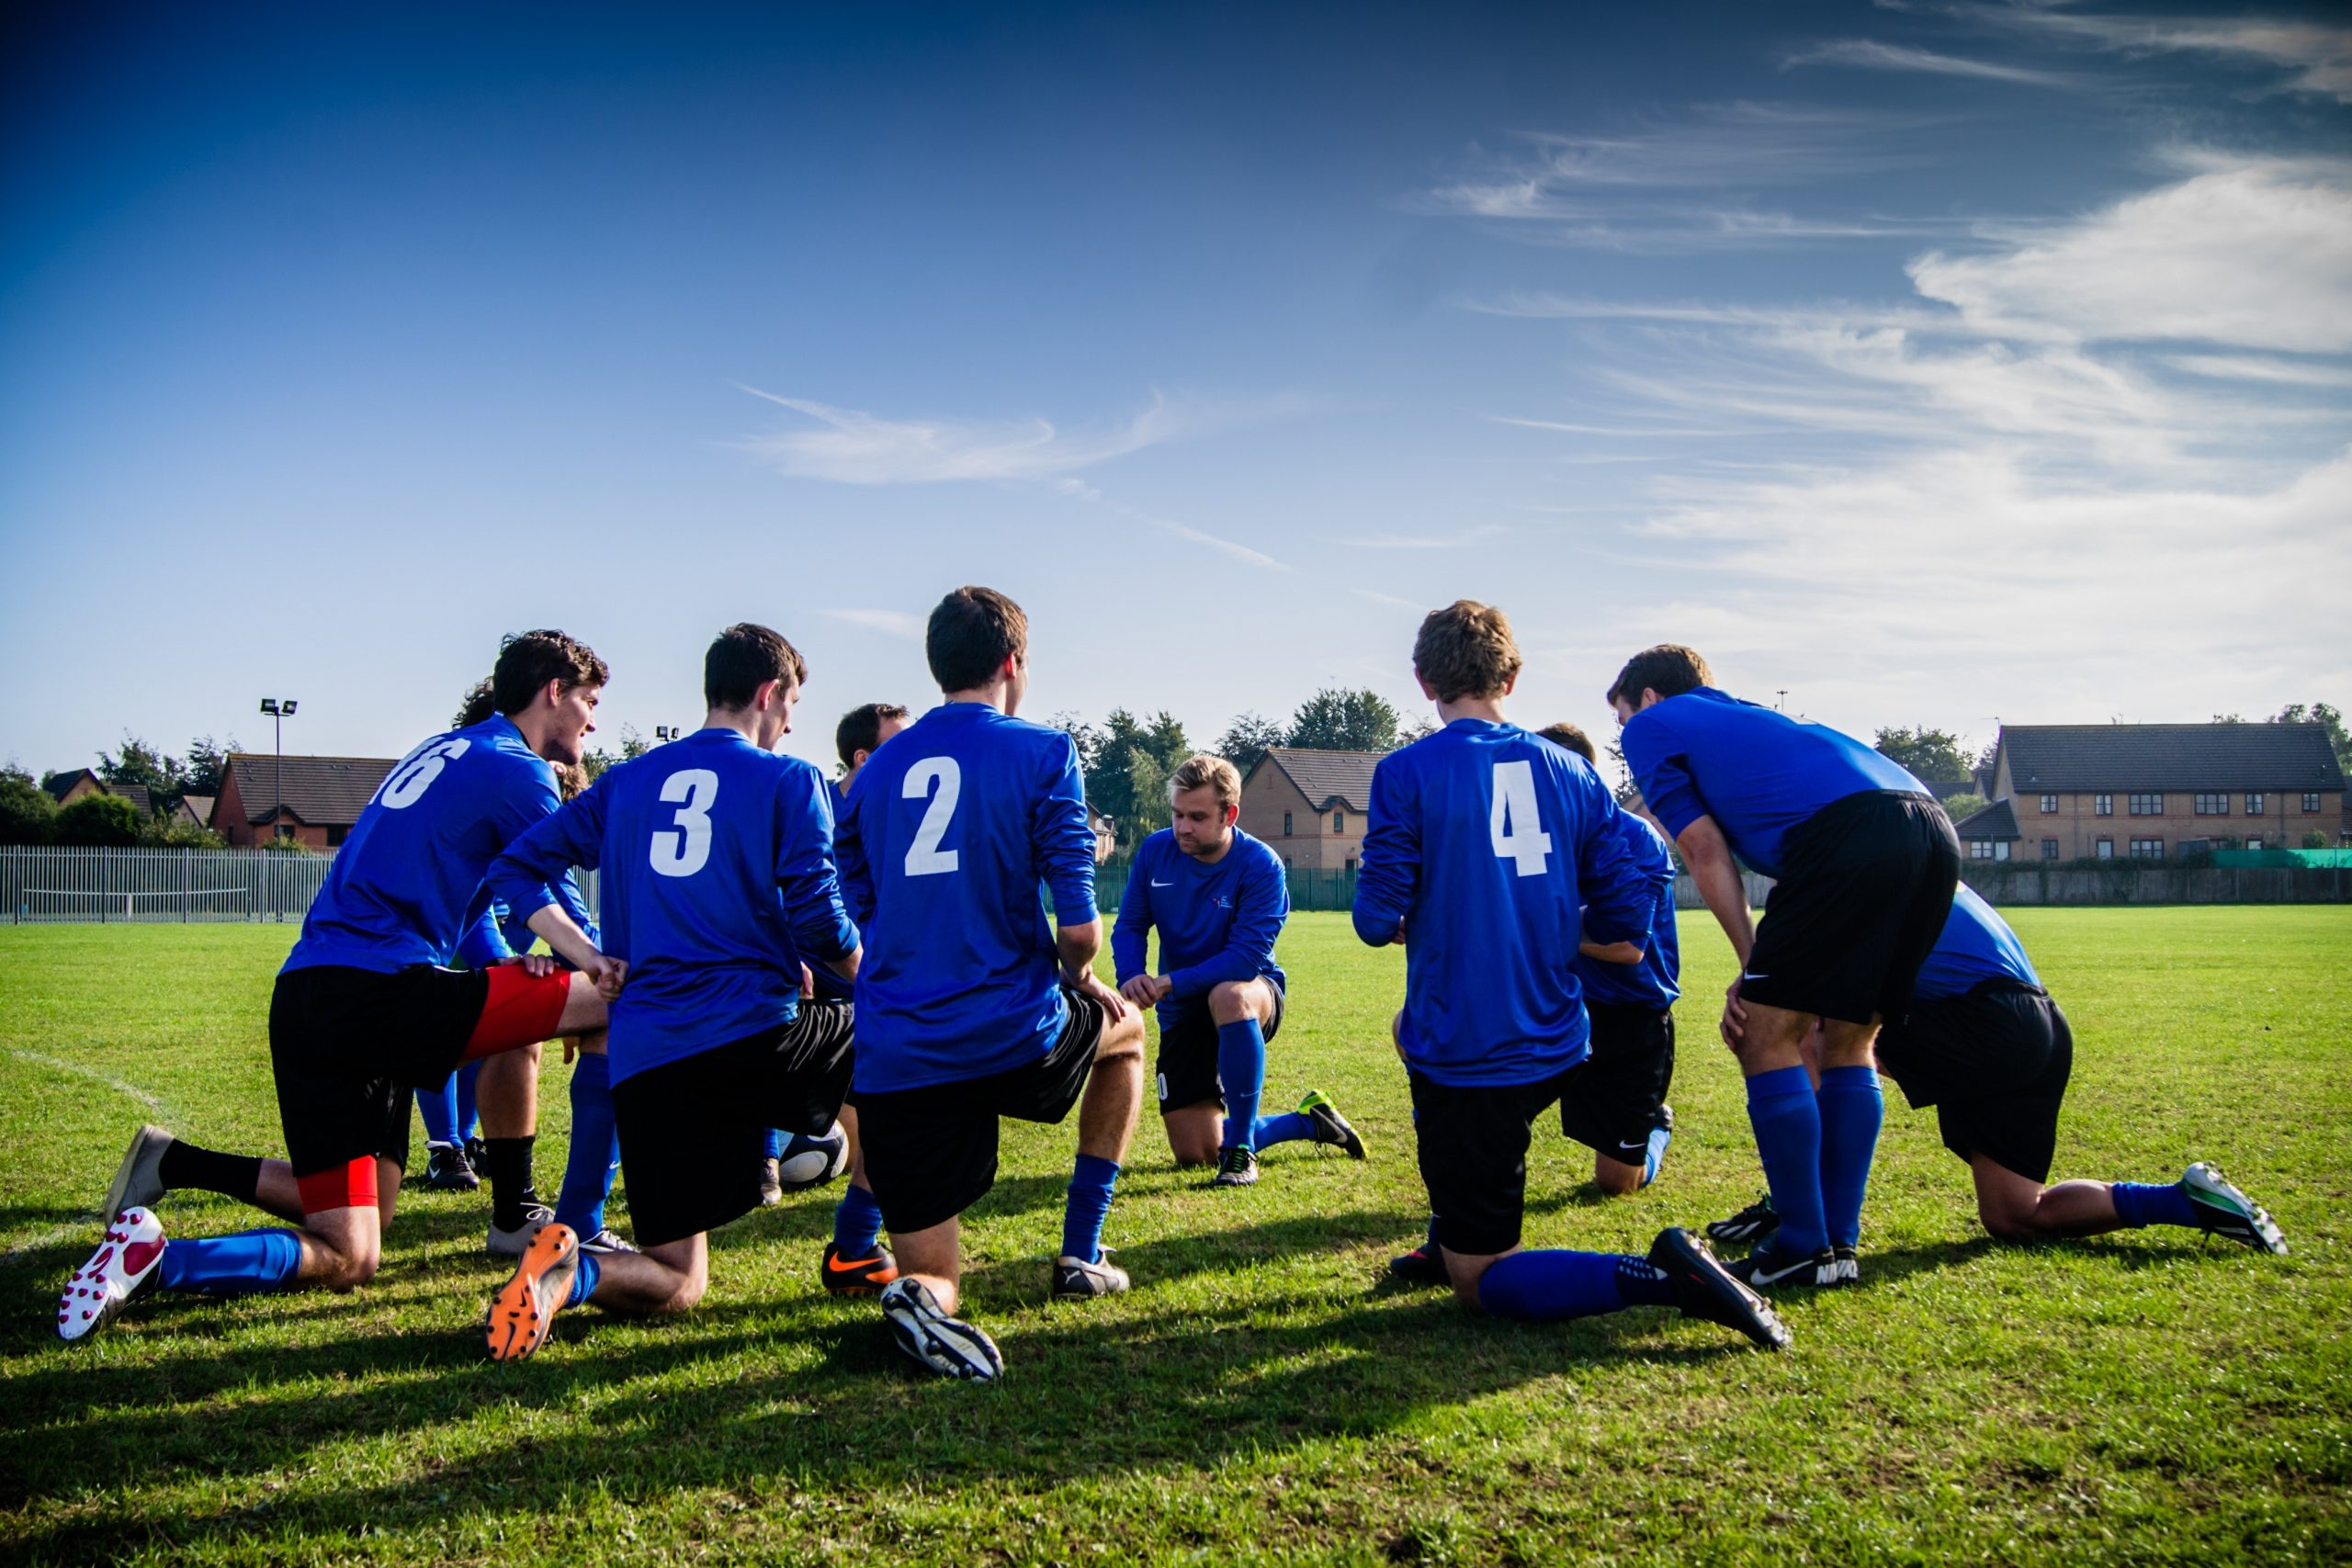 sport et lien social